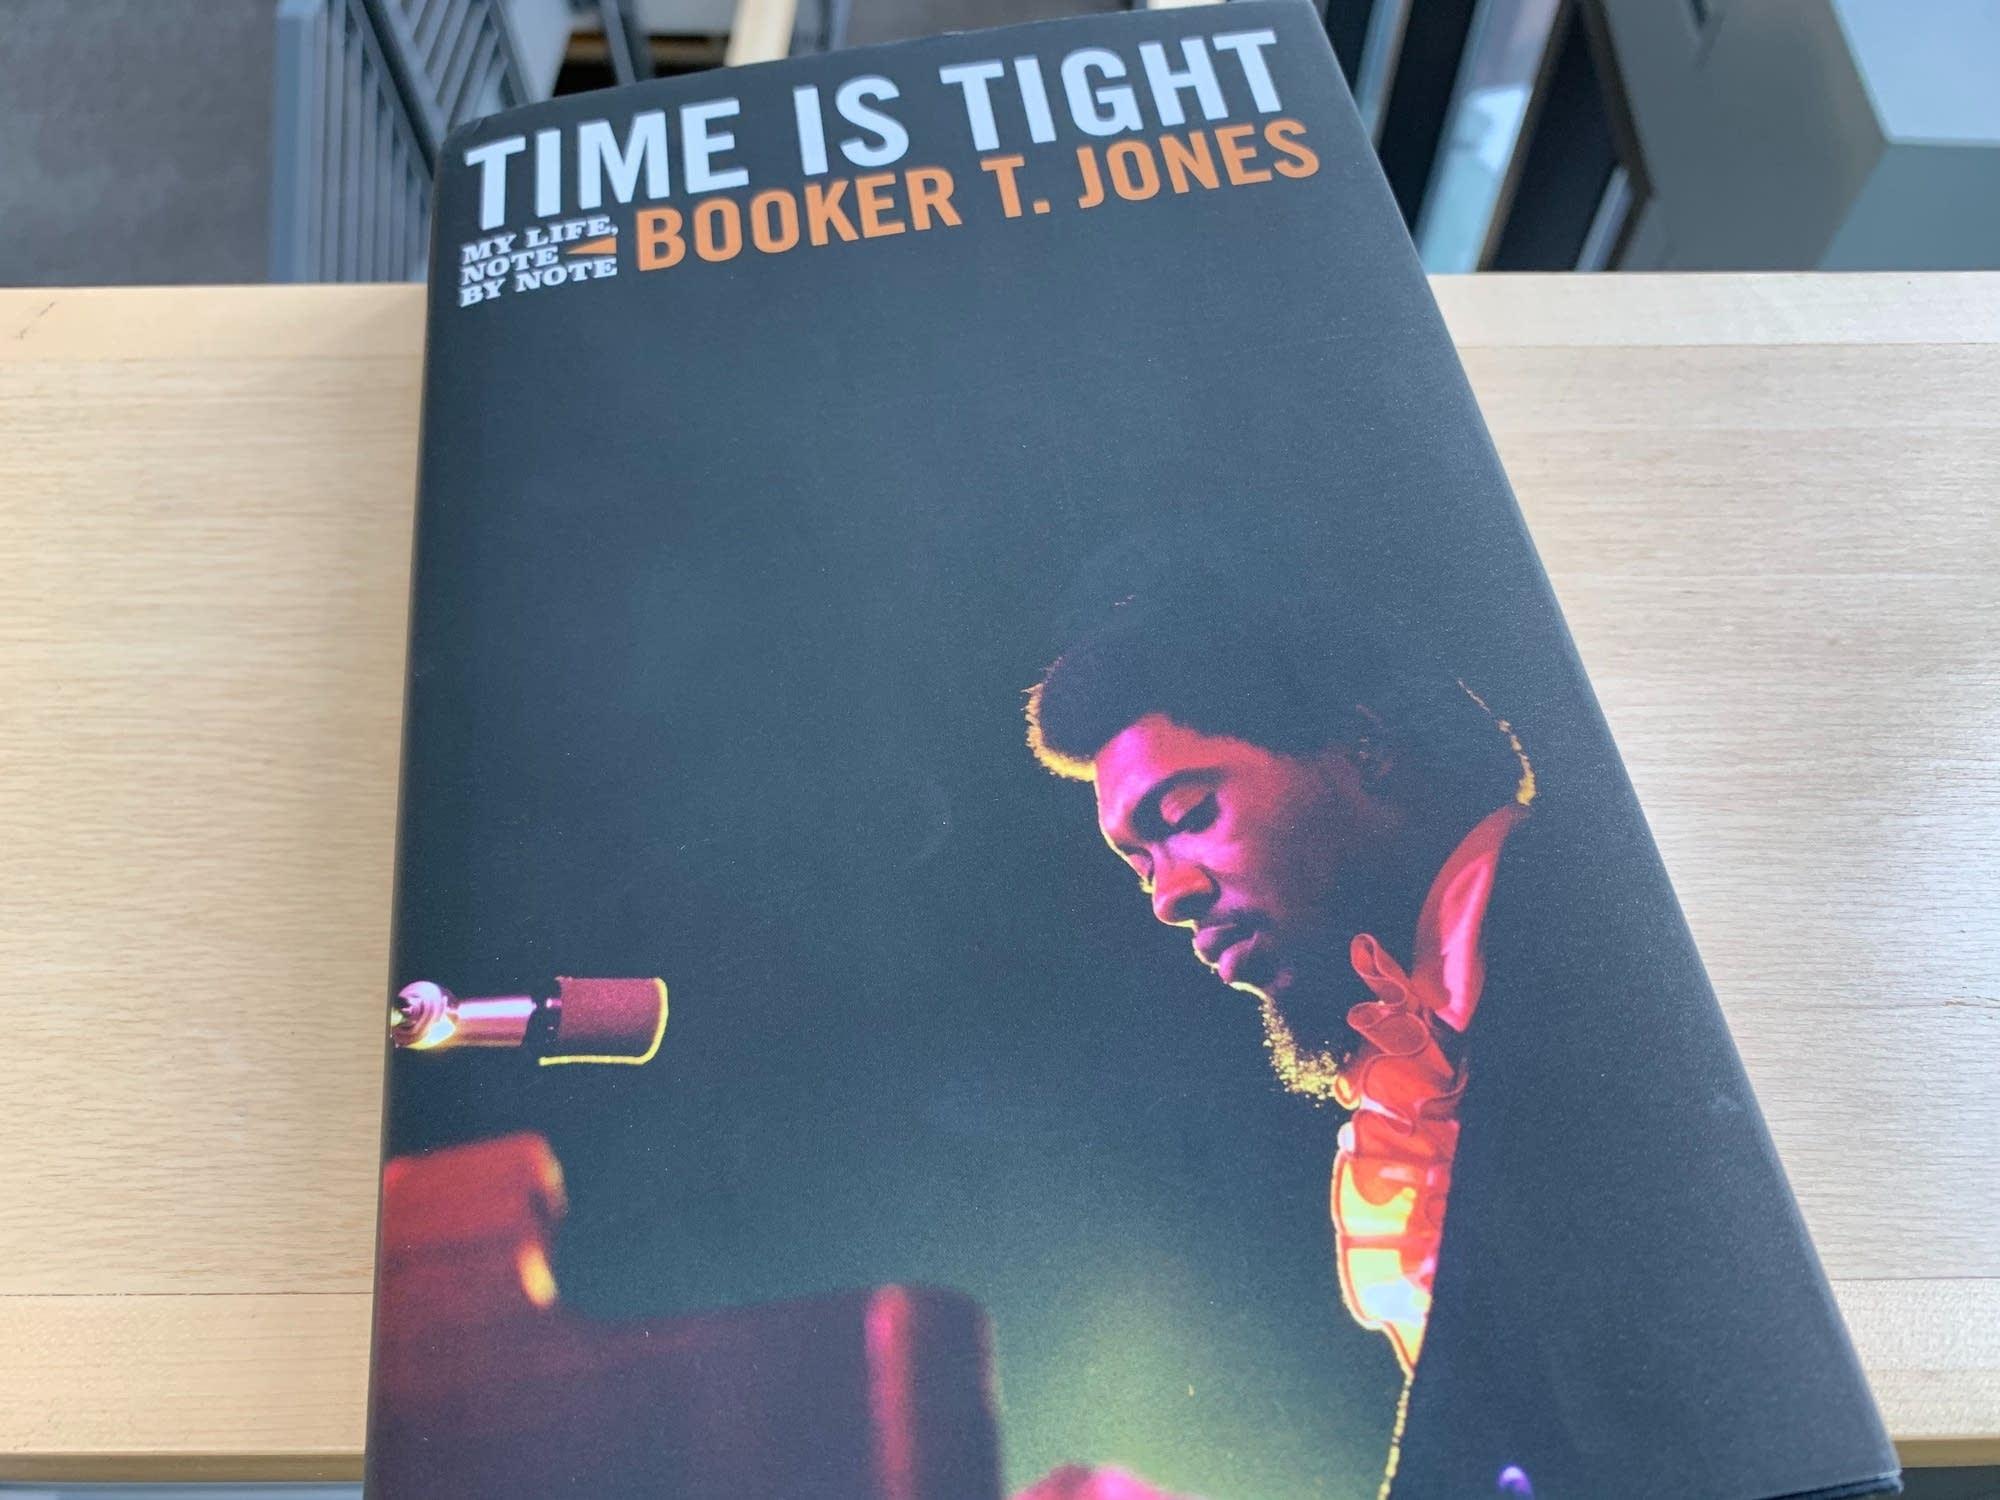 Booker T. Jones's memoir 'Time is Tight.'